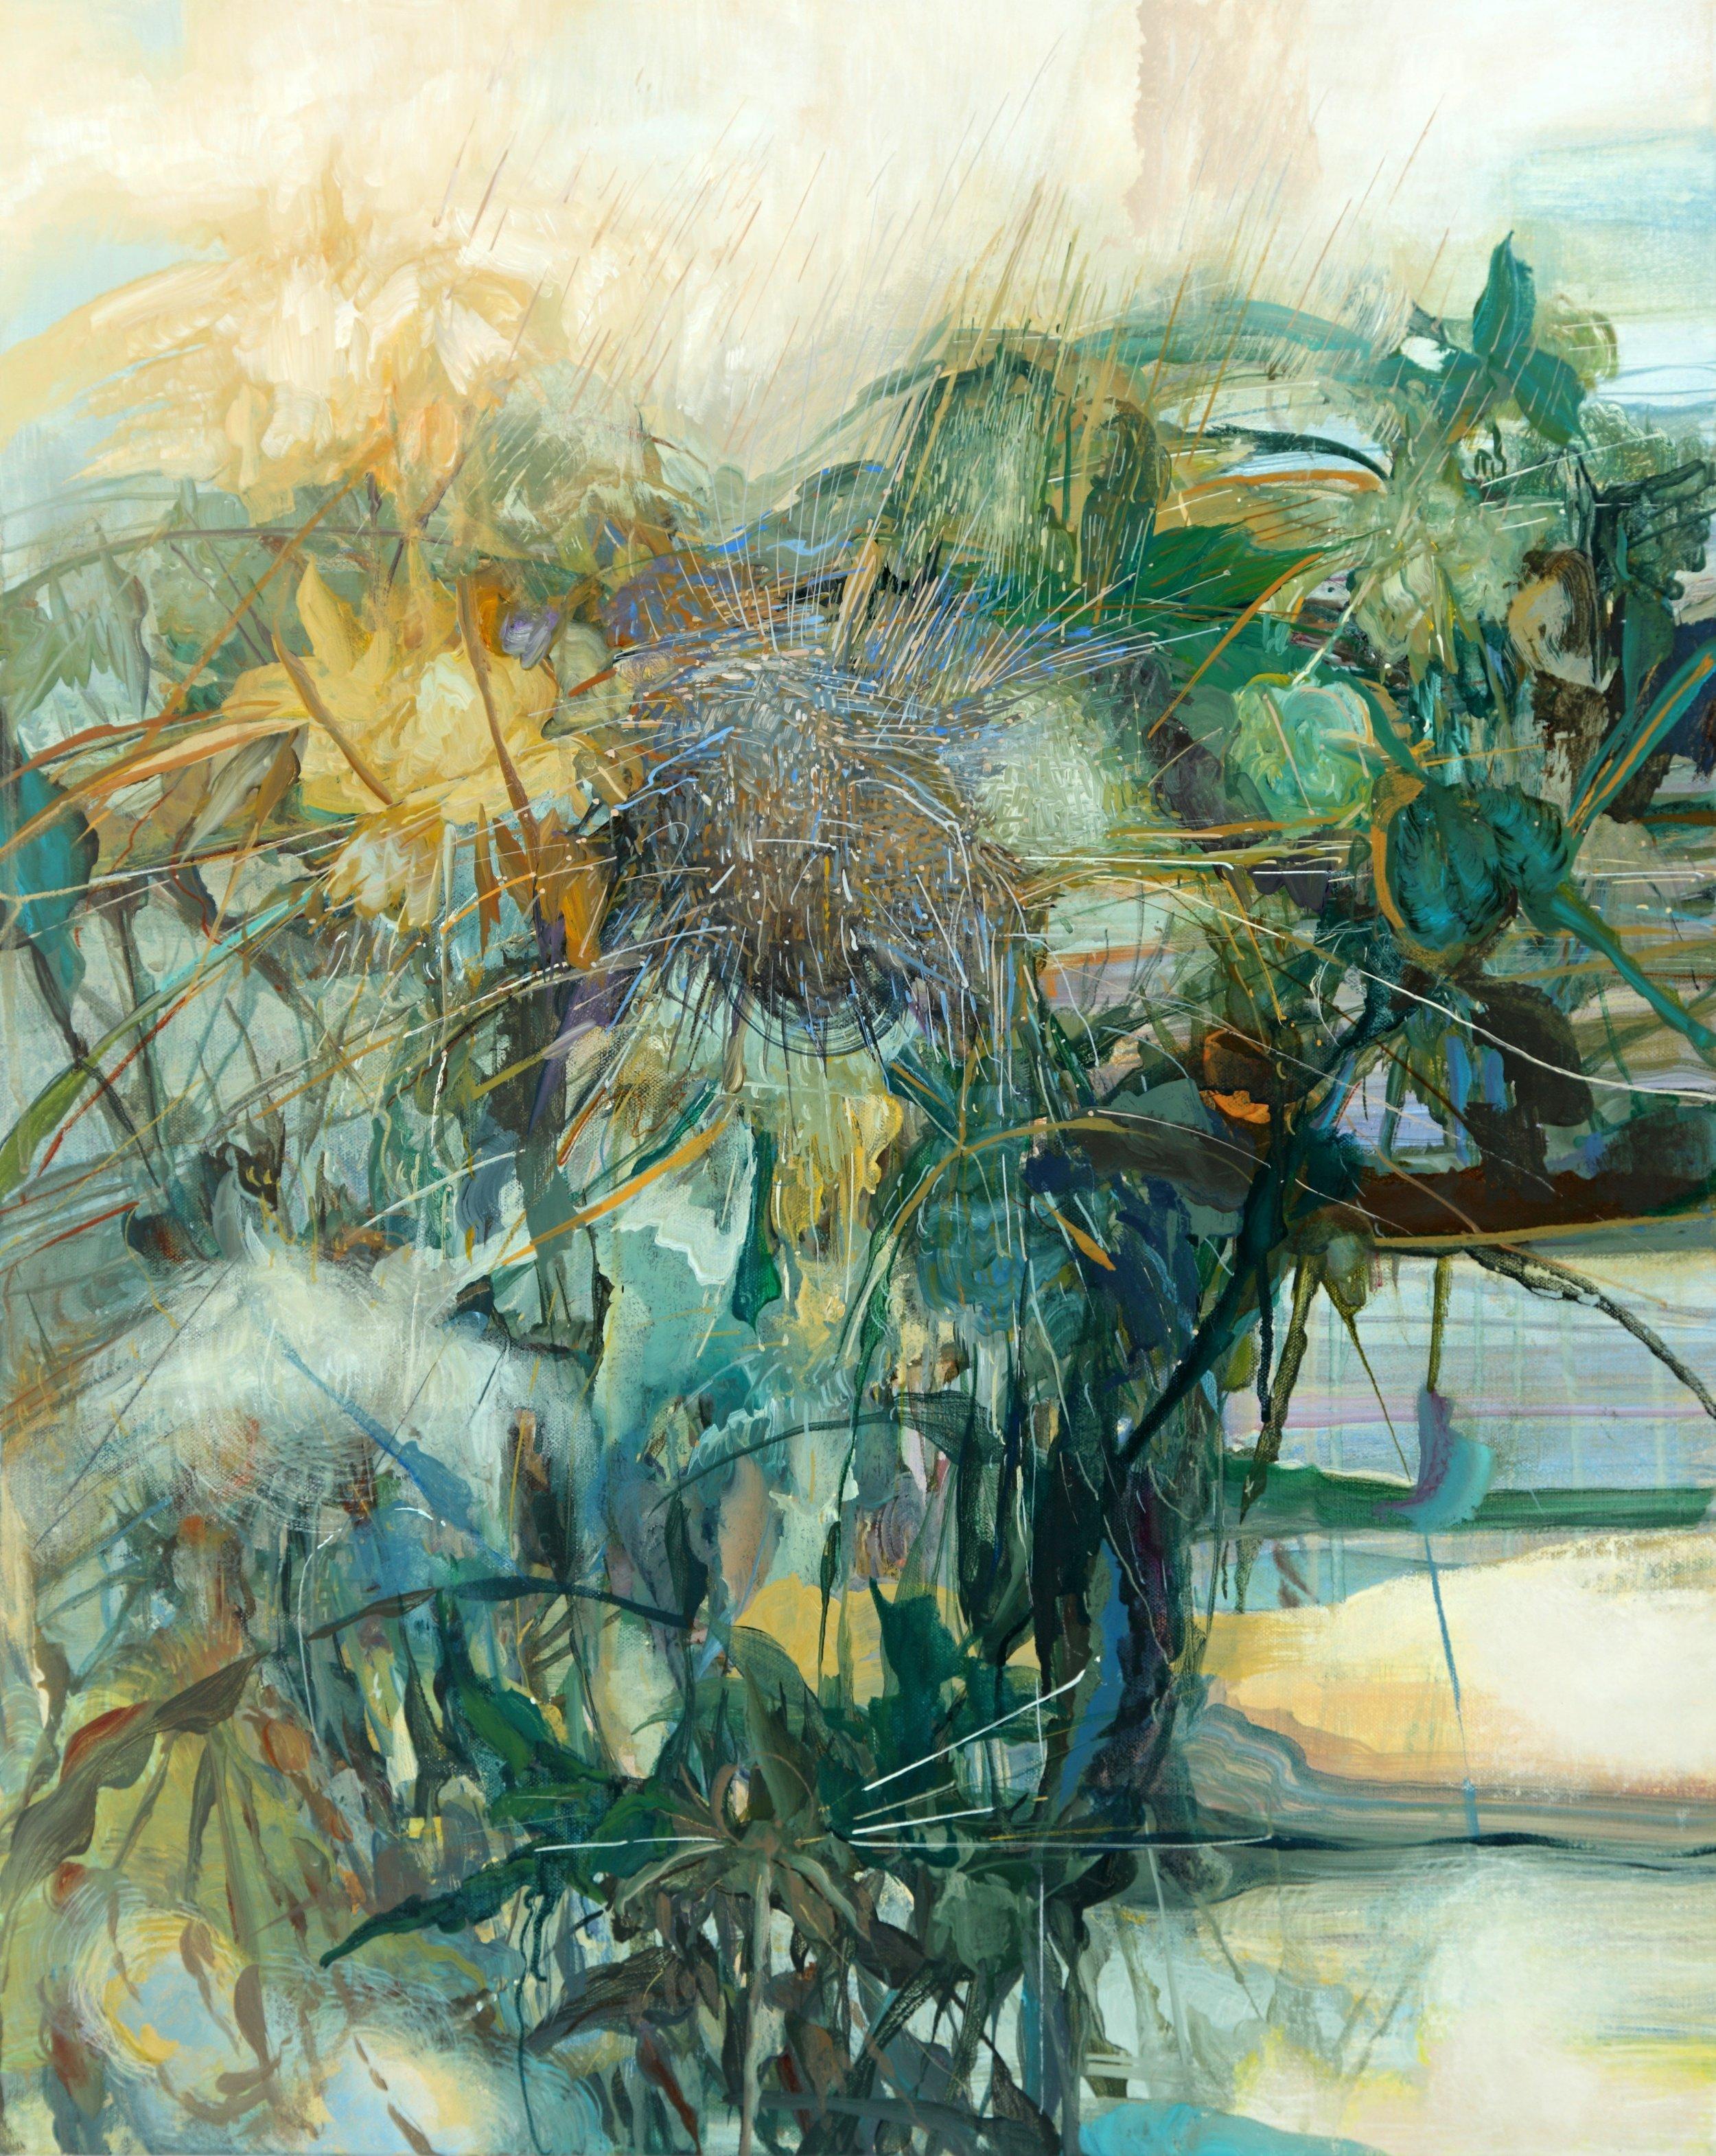 2. Spectral, wind and rain, 2014, 30 x 24 ins. acrylic on canvas.jpg